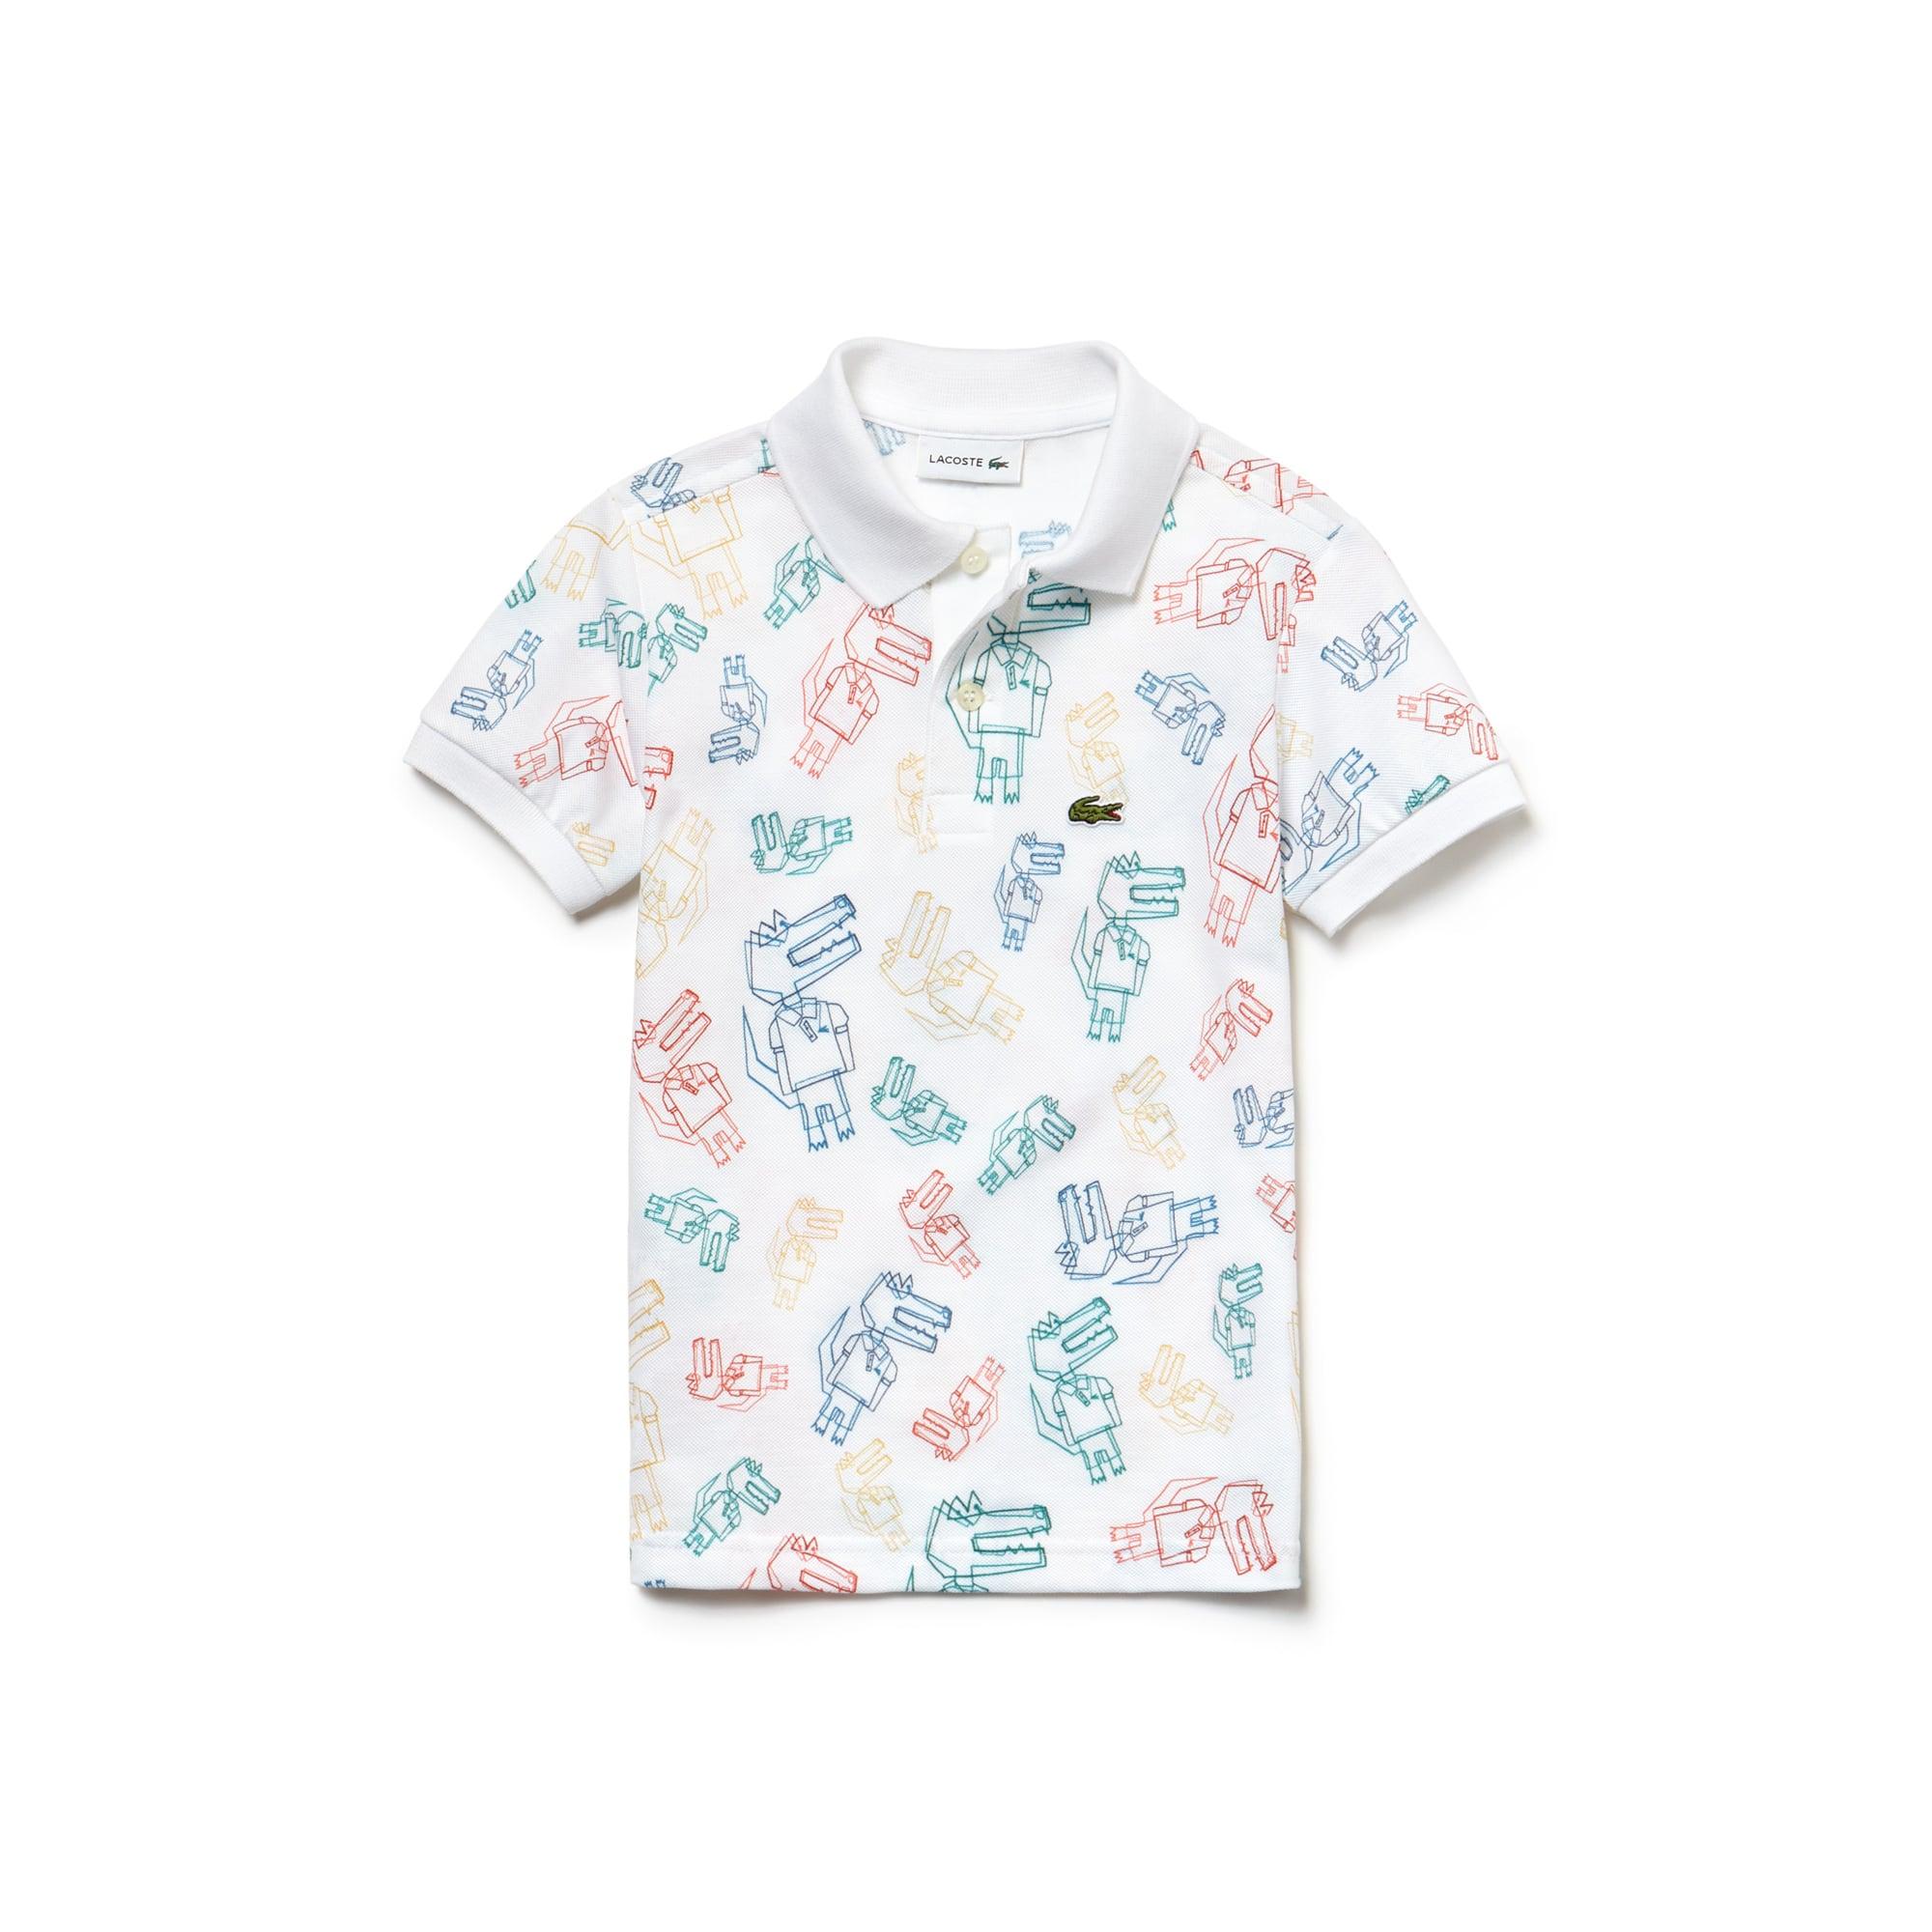 8e675b2d7131d Camisa Polo Lacoste Masculina Infantil em Minipiqué Estampado